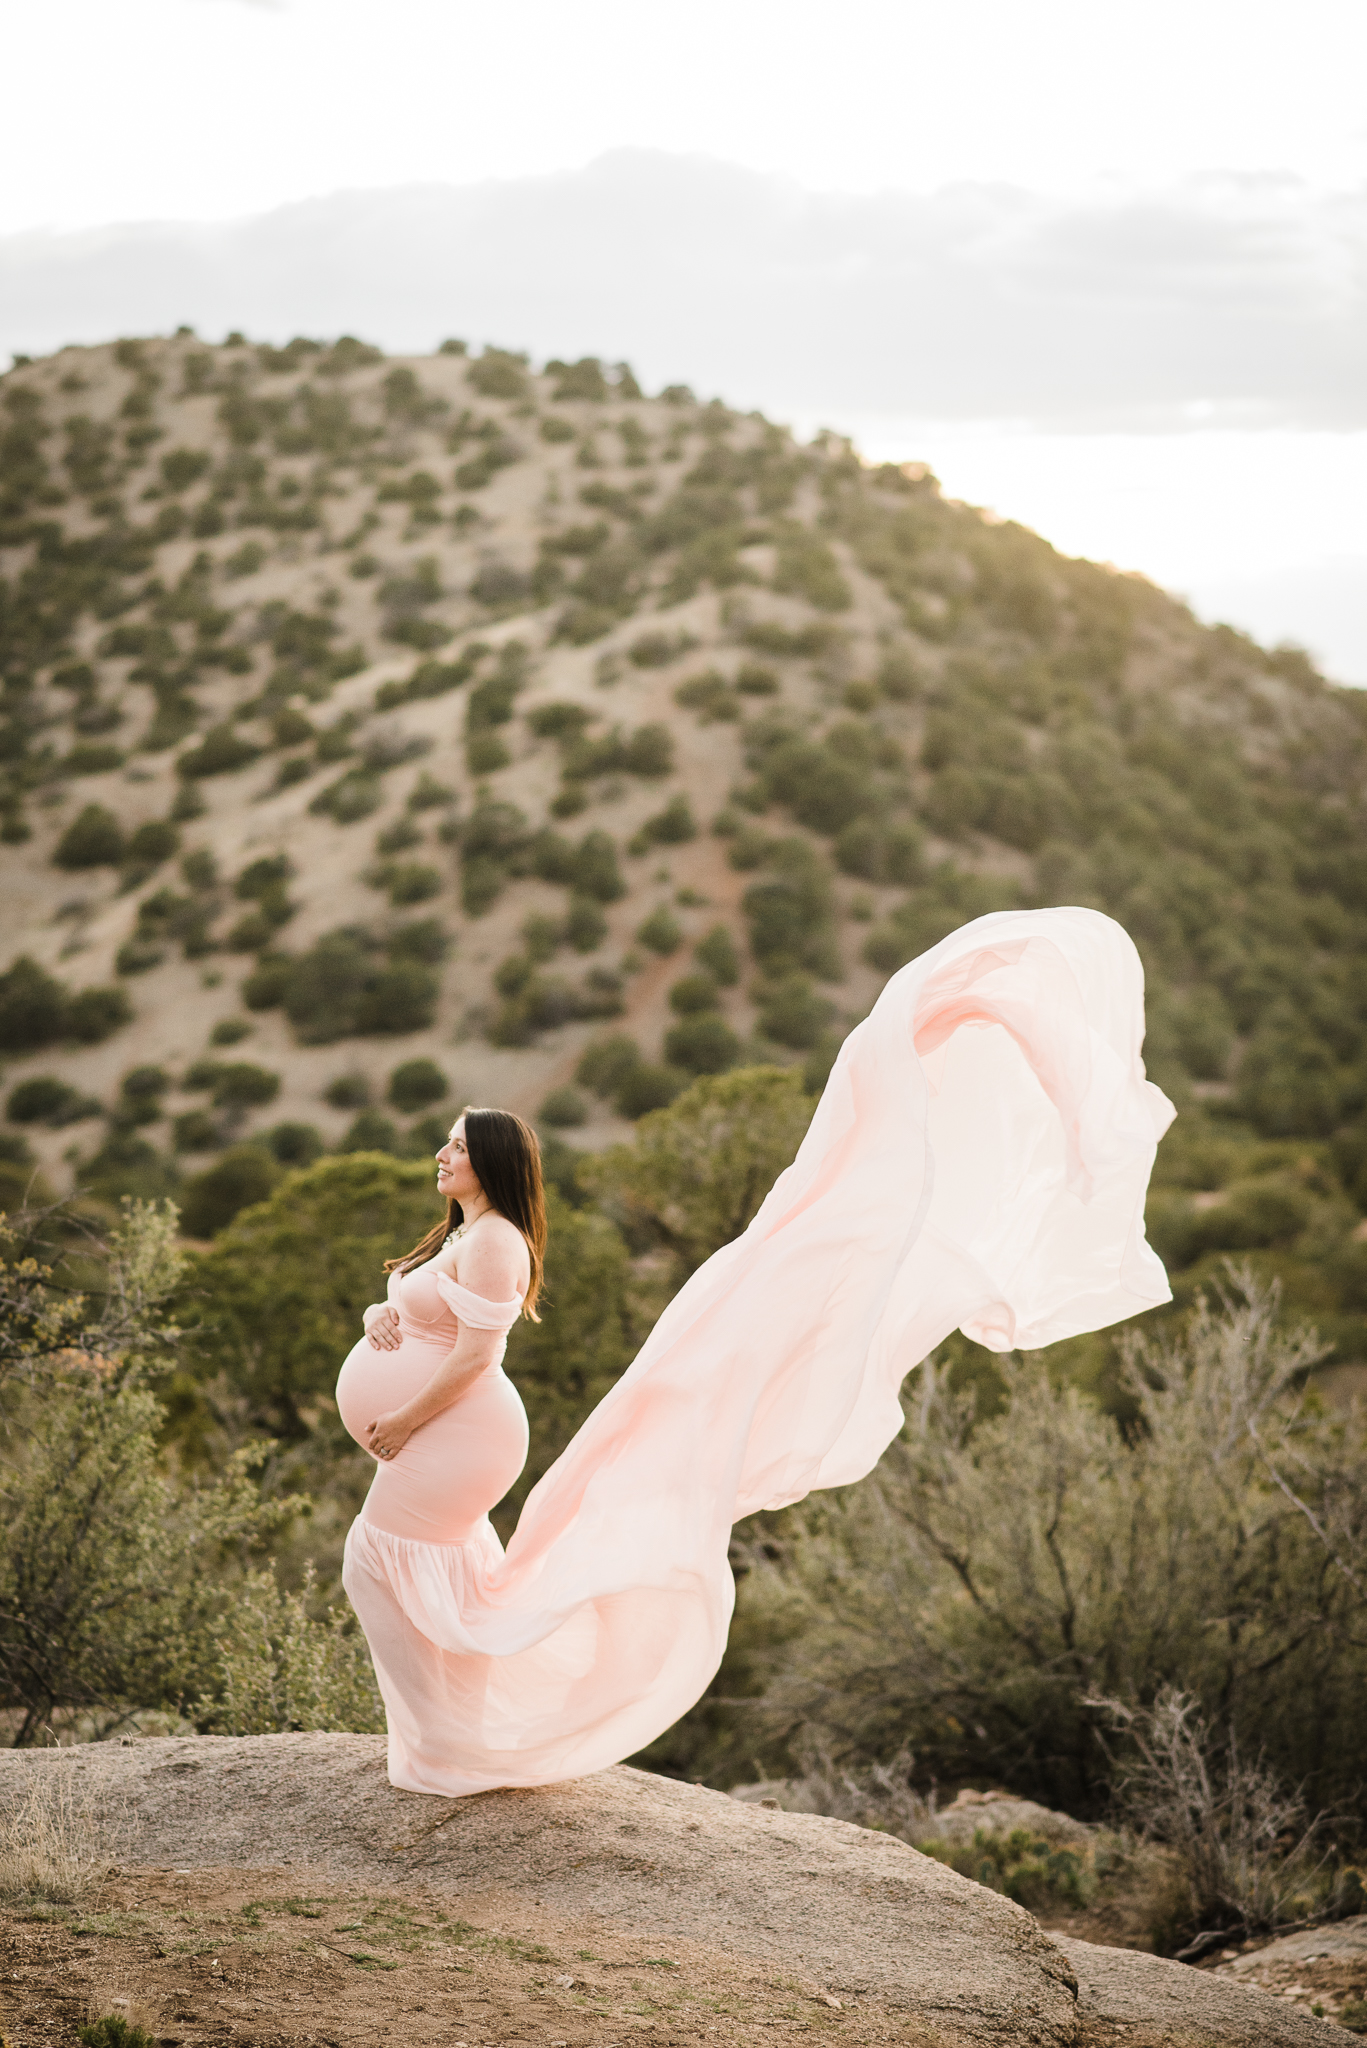 Albuquerque Photographers | Santa Fe Photographers | Albuquerque Photographer | Santa Fe Photographer | Albuquerque Maternity Photographer | Santa Fe Maternity Photographer | Rio Rancho Photographer | Rio Rancho Maternity Photographer